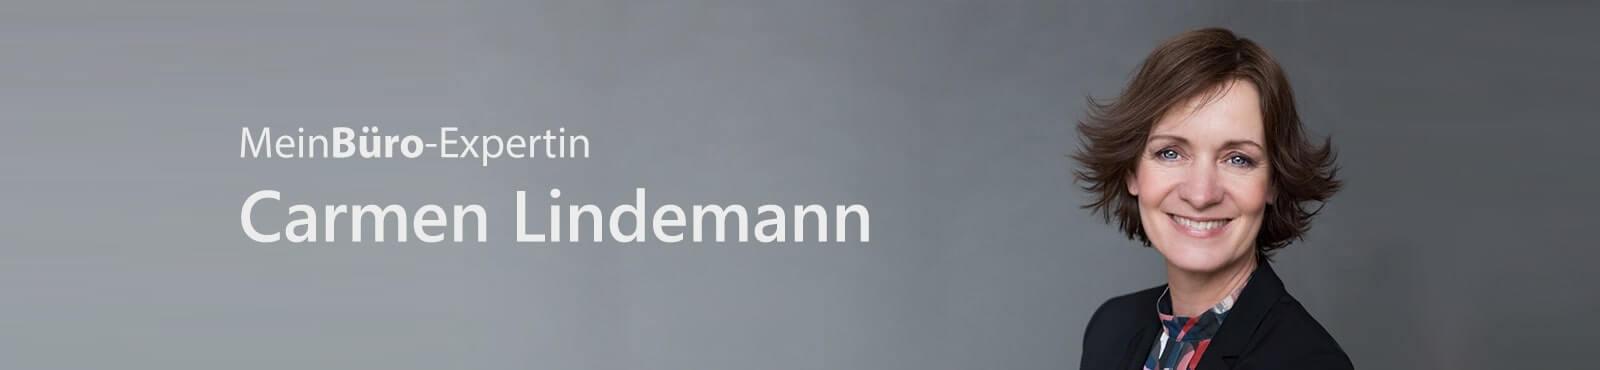 Carmen Lindemann: Expertin für MeinBüro Bürosoftware